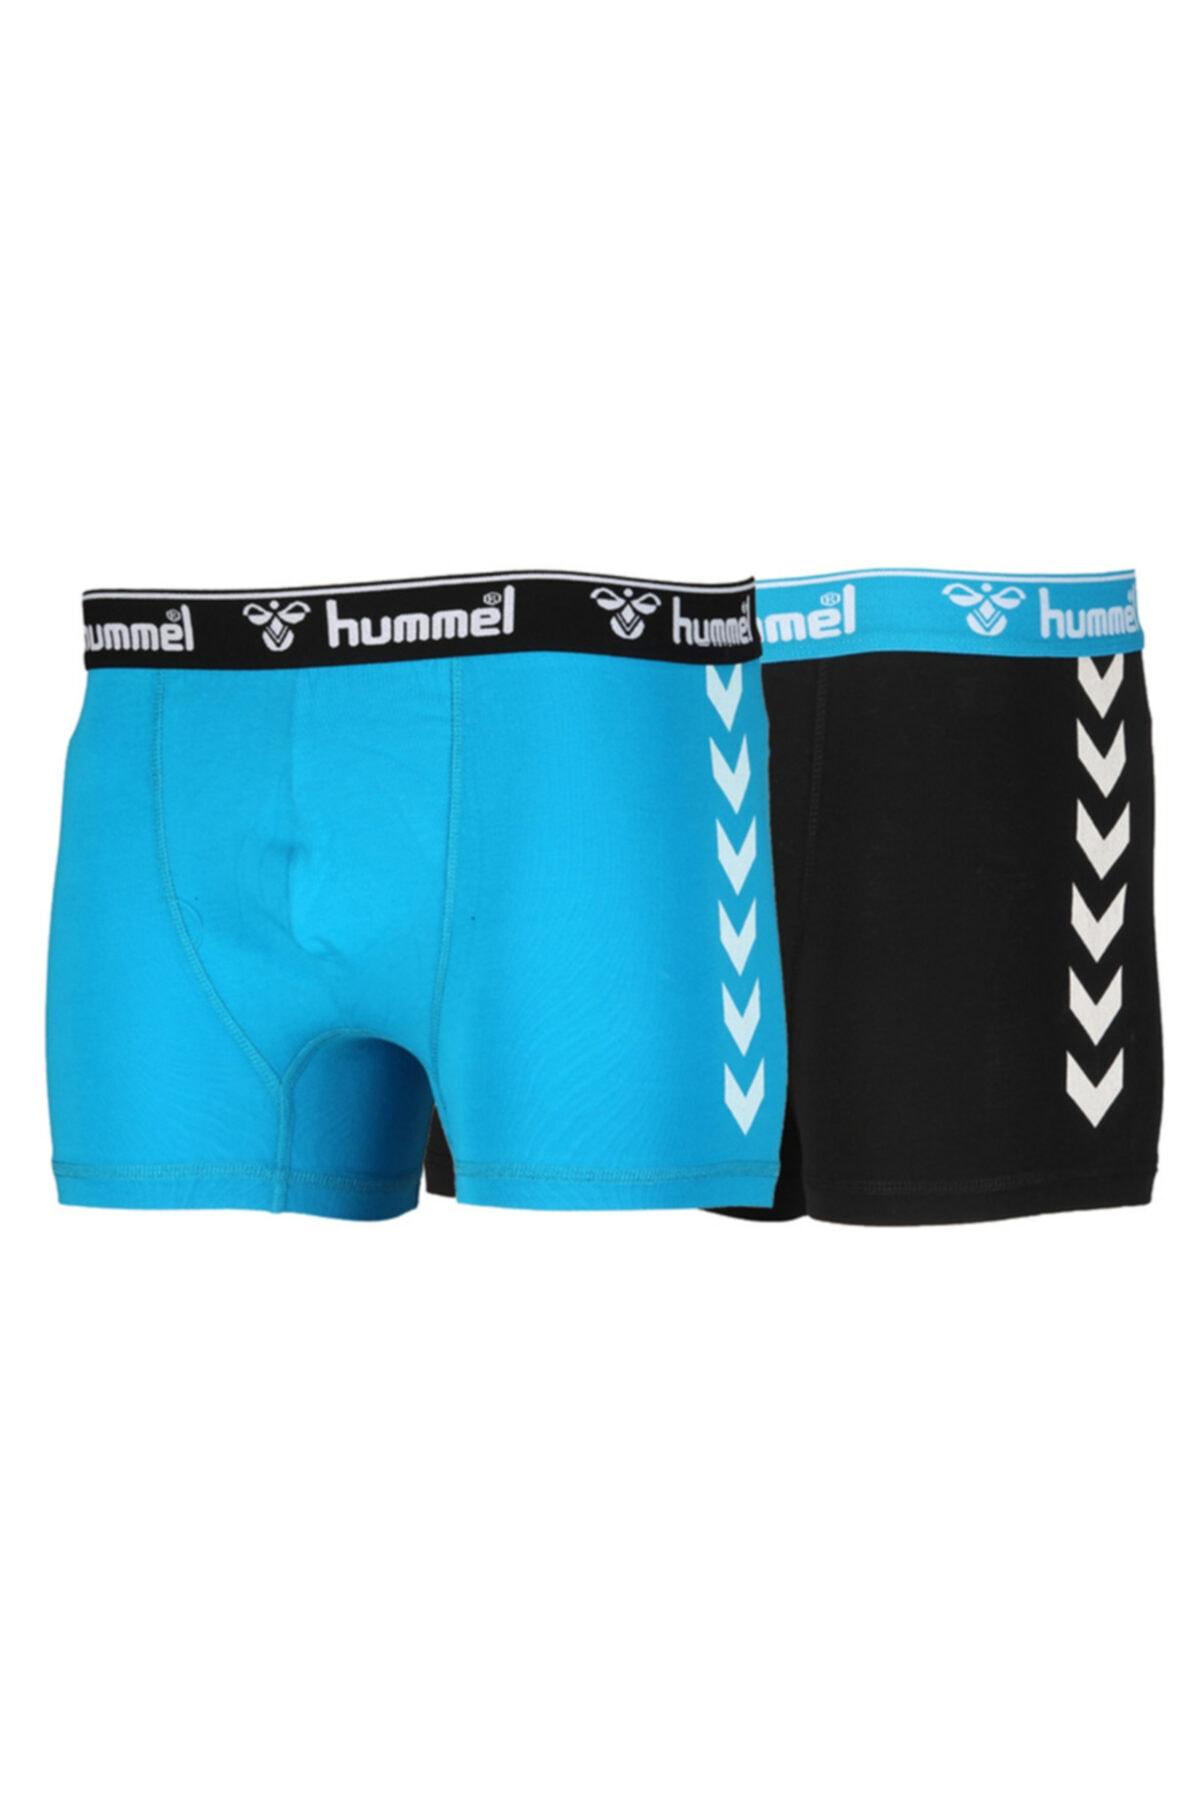 HUMMEL Hanky Boxers 2-pk 1